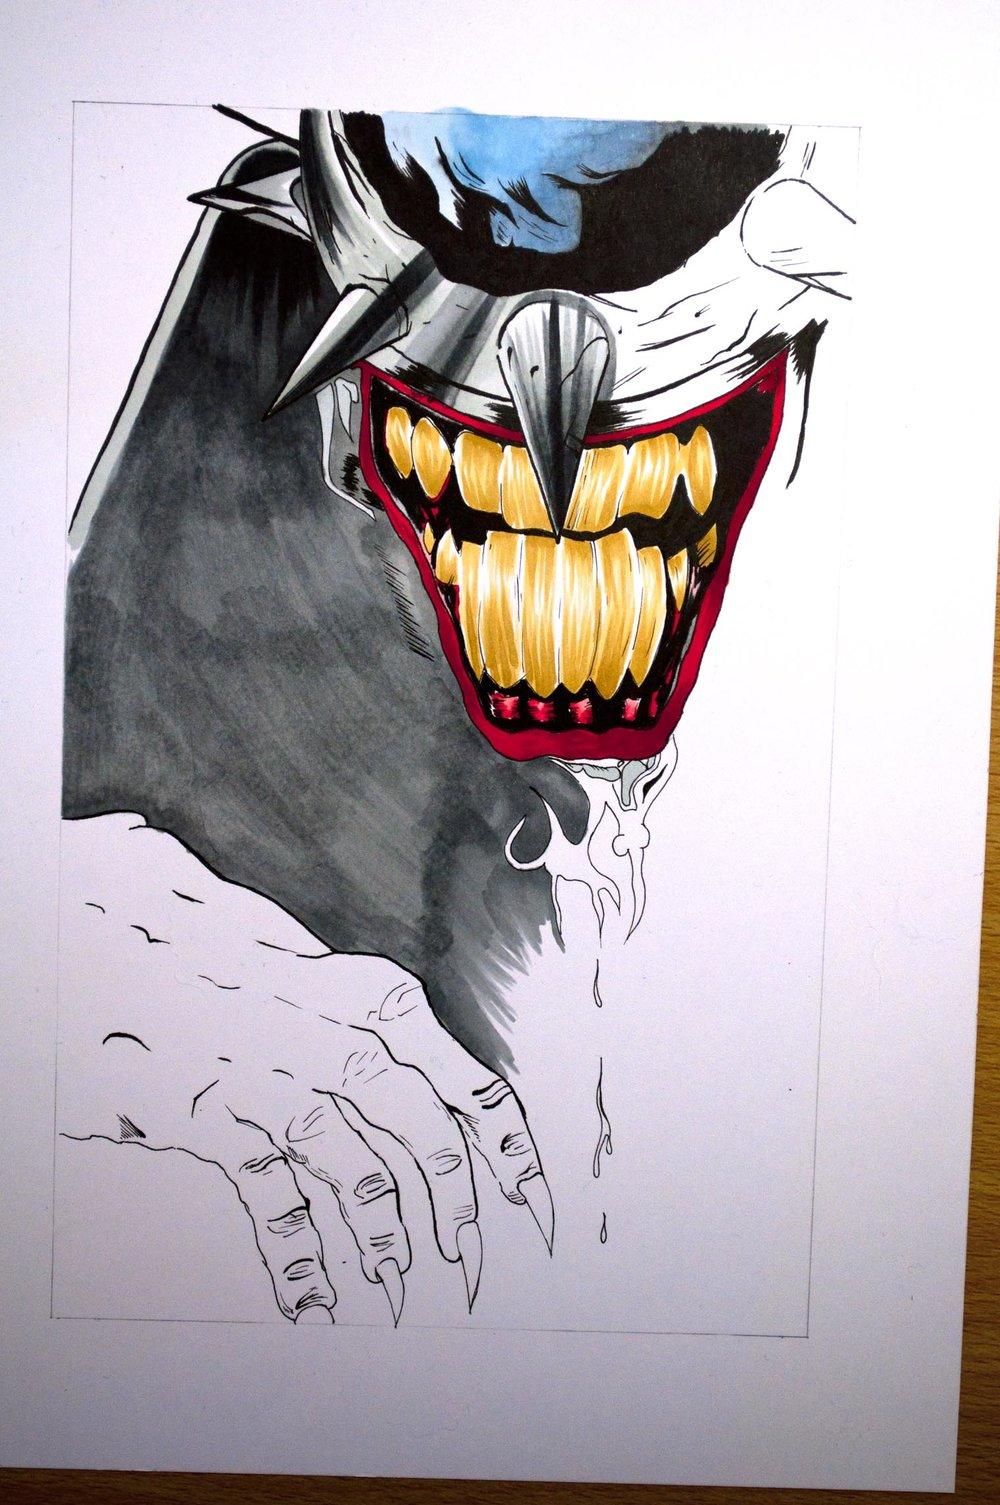 Laughing Batman Image 1.jpg